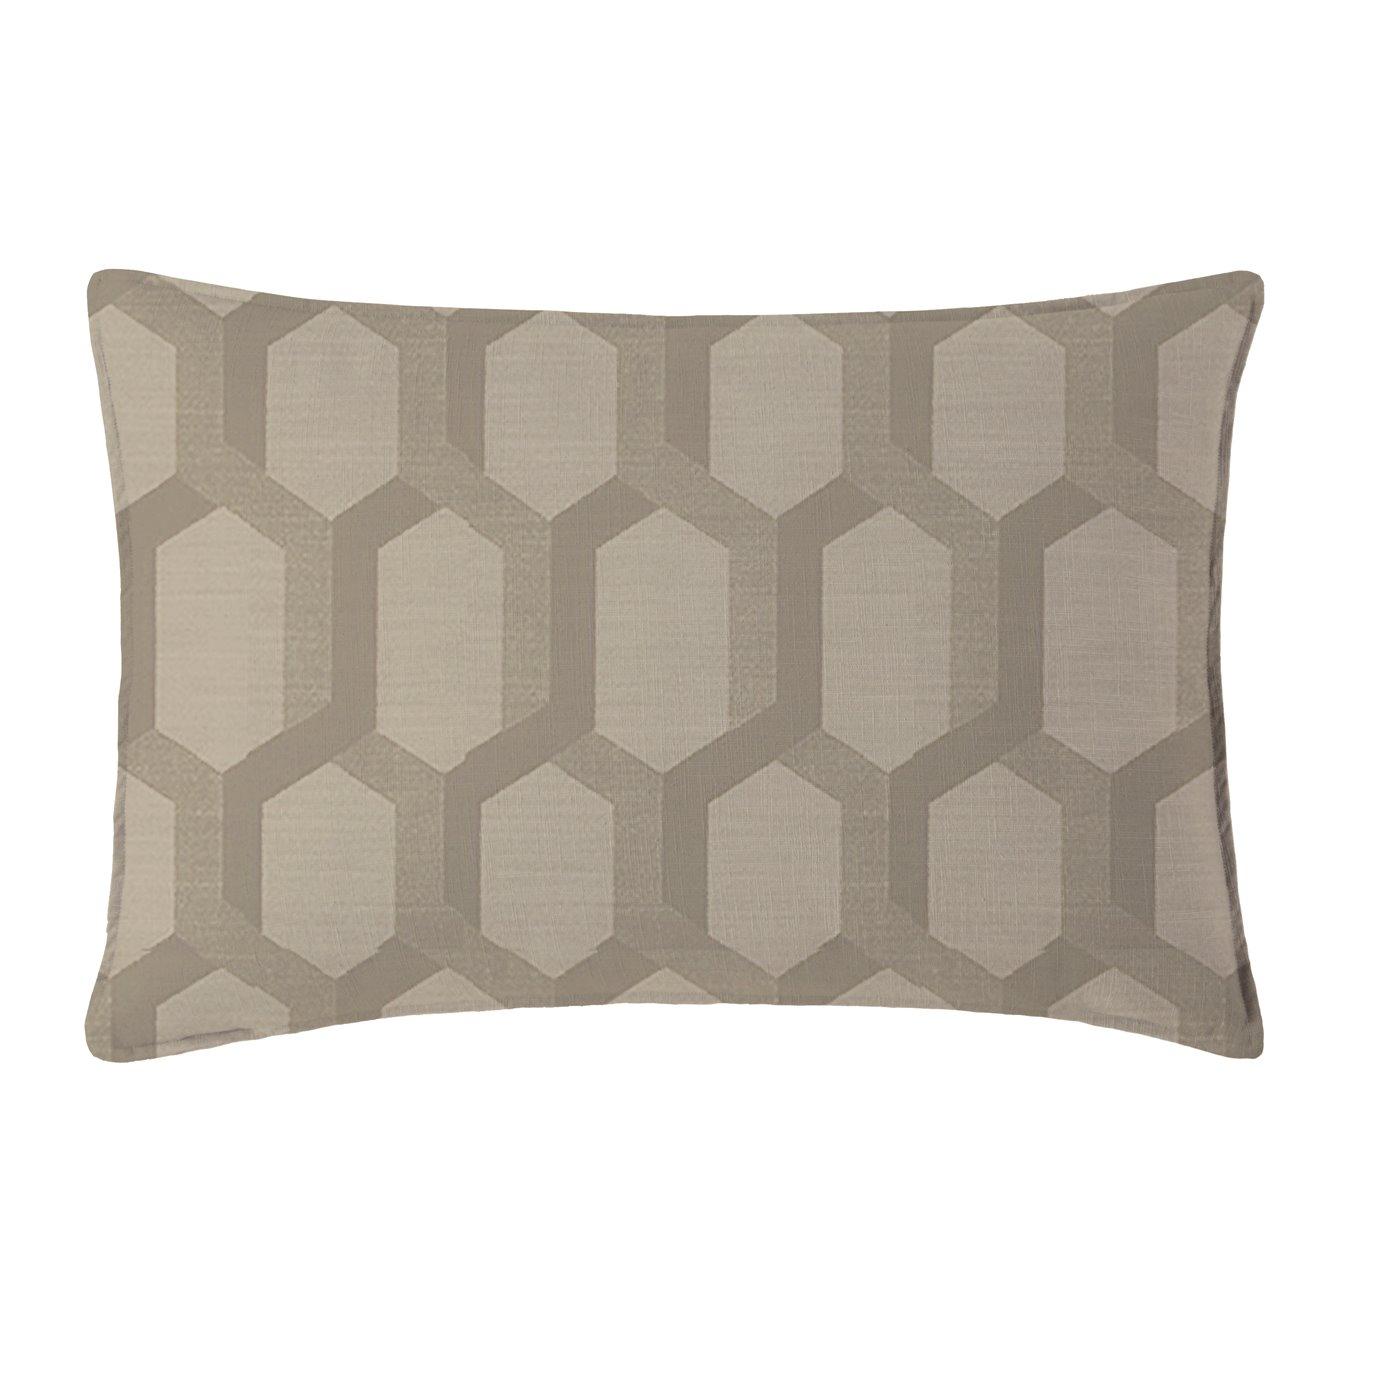 Maidstone Taupe Pillow Sham King